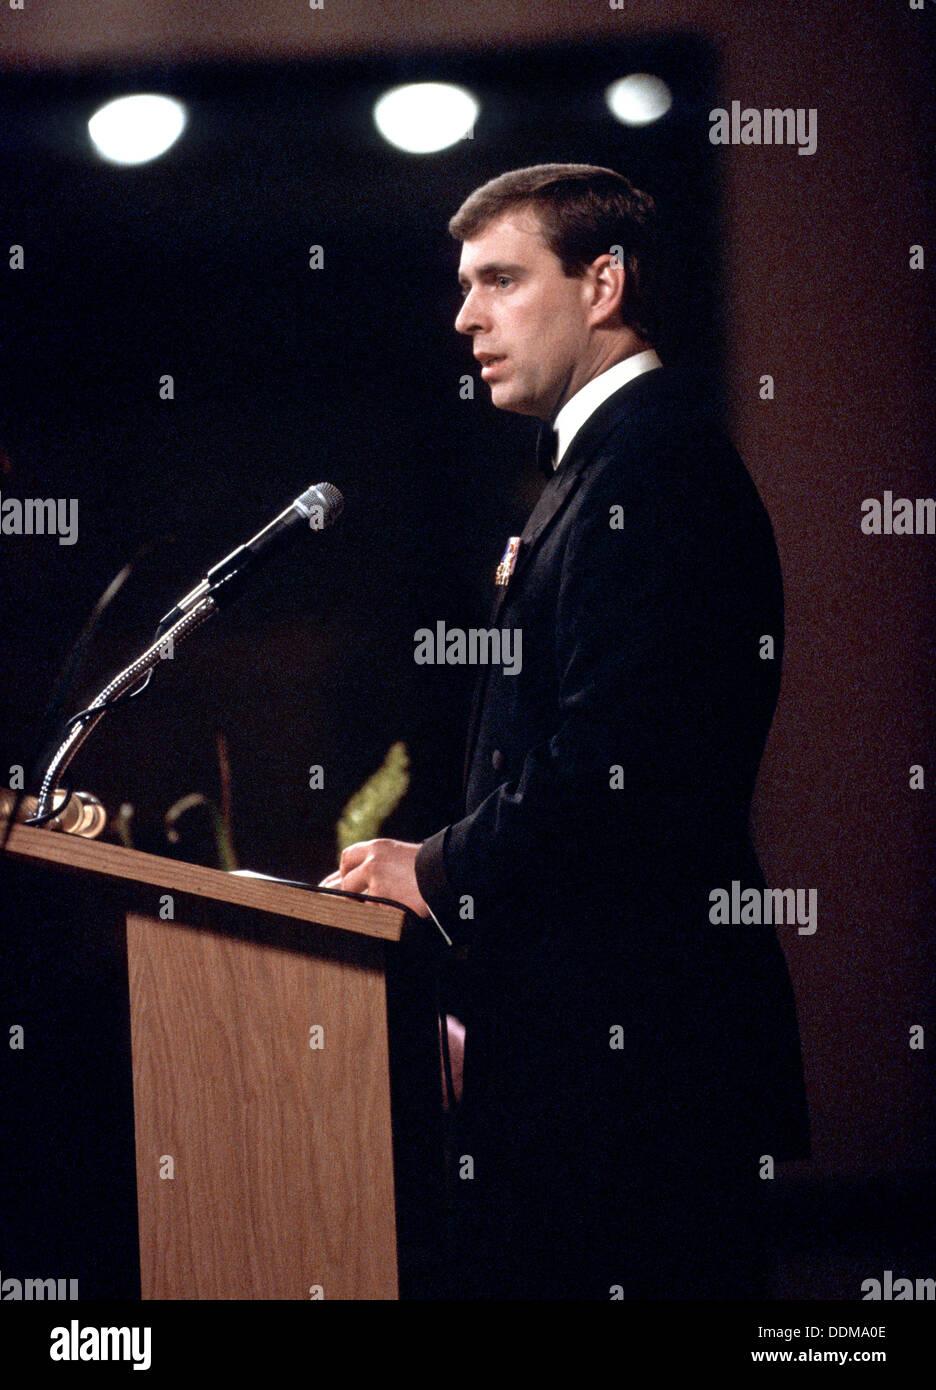 fascinat prince andrews speech - HD937×1390